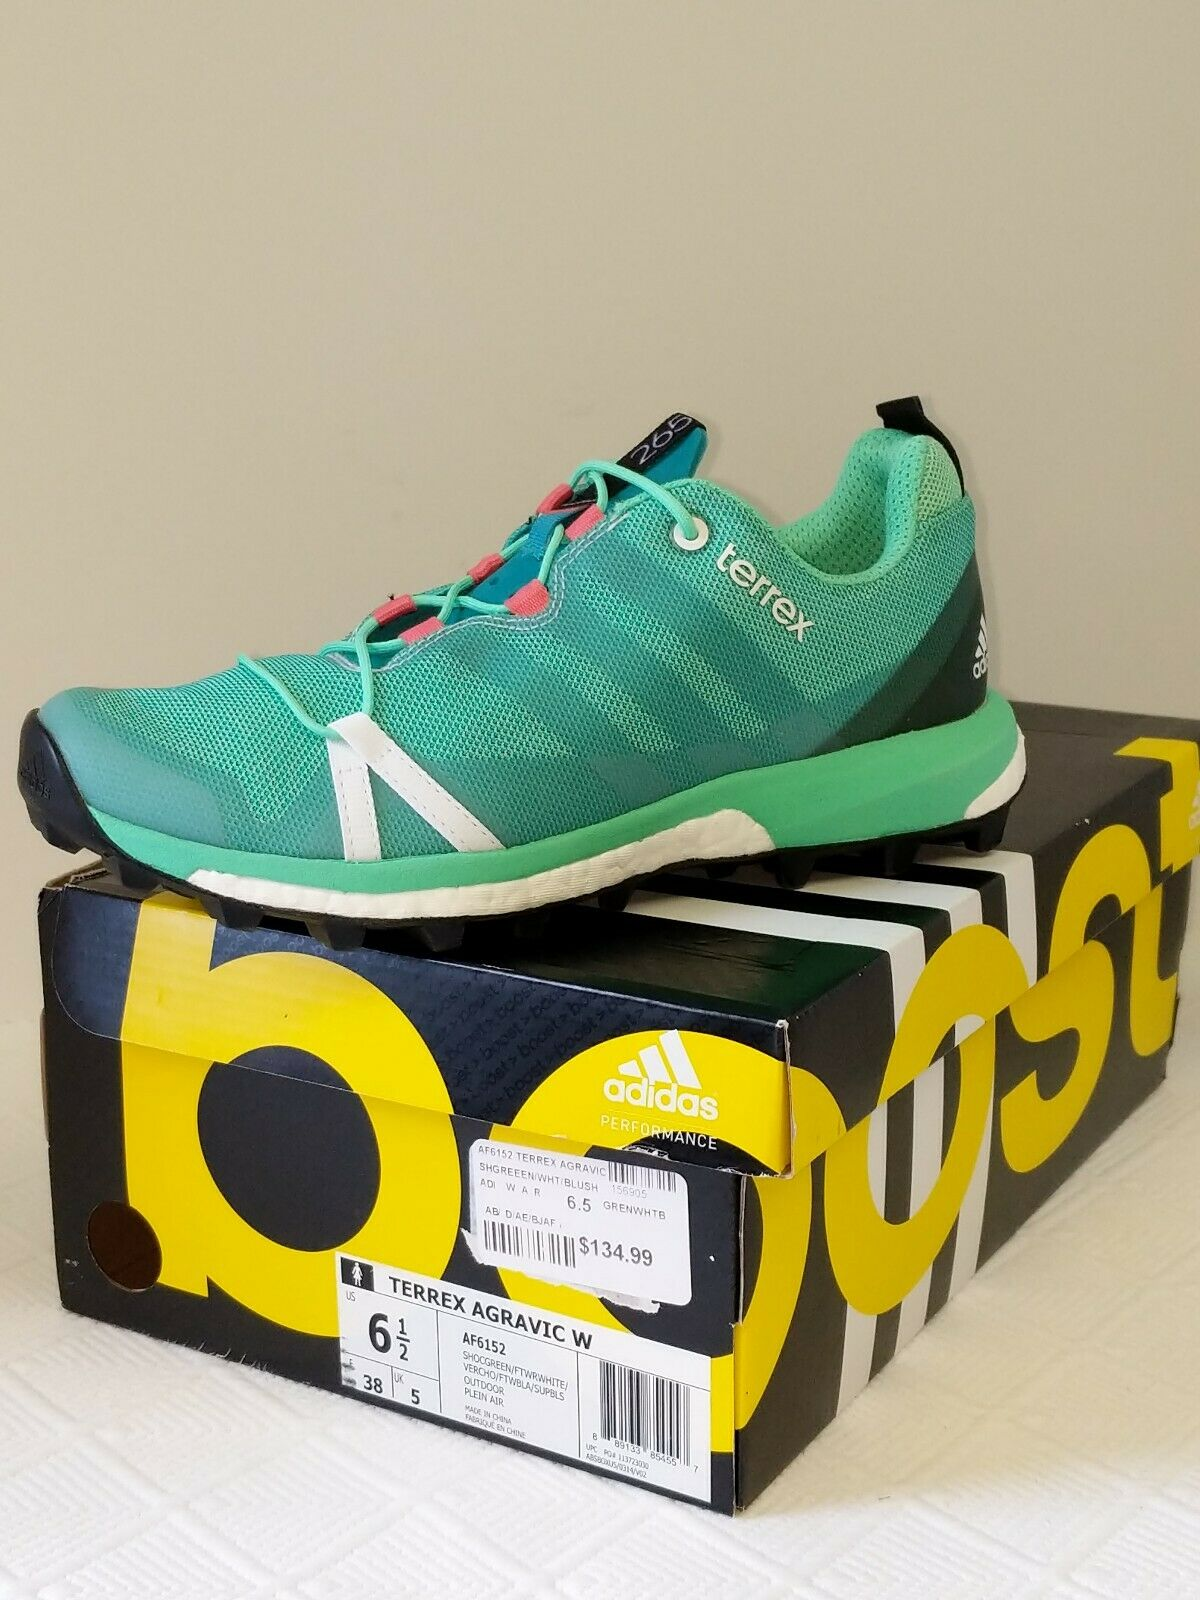 Adidas 6.5 NWB femminile  135 Terrex Agravic Running   Trail scarpe  nuovo stile